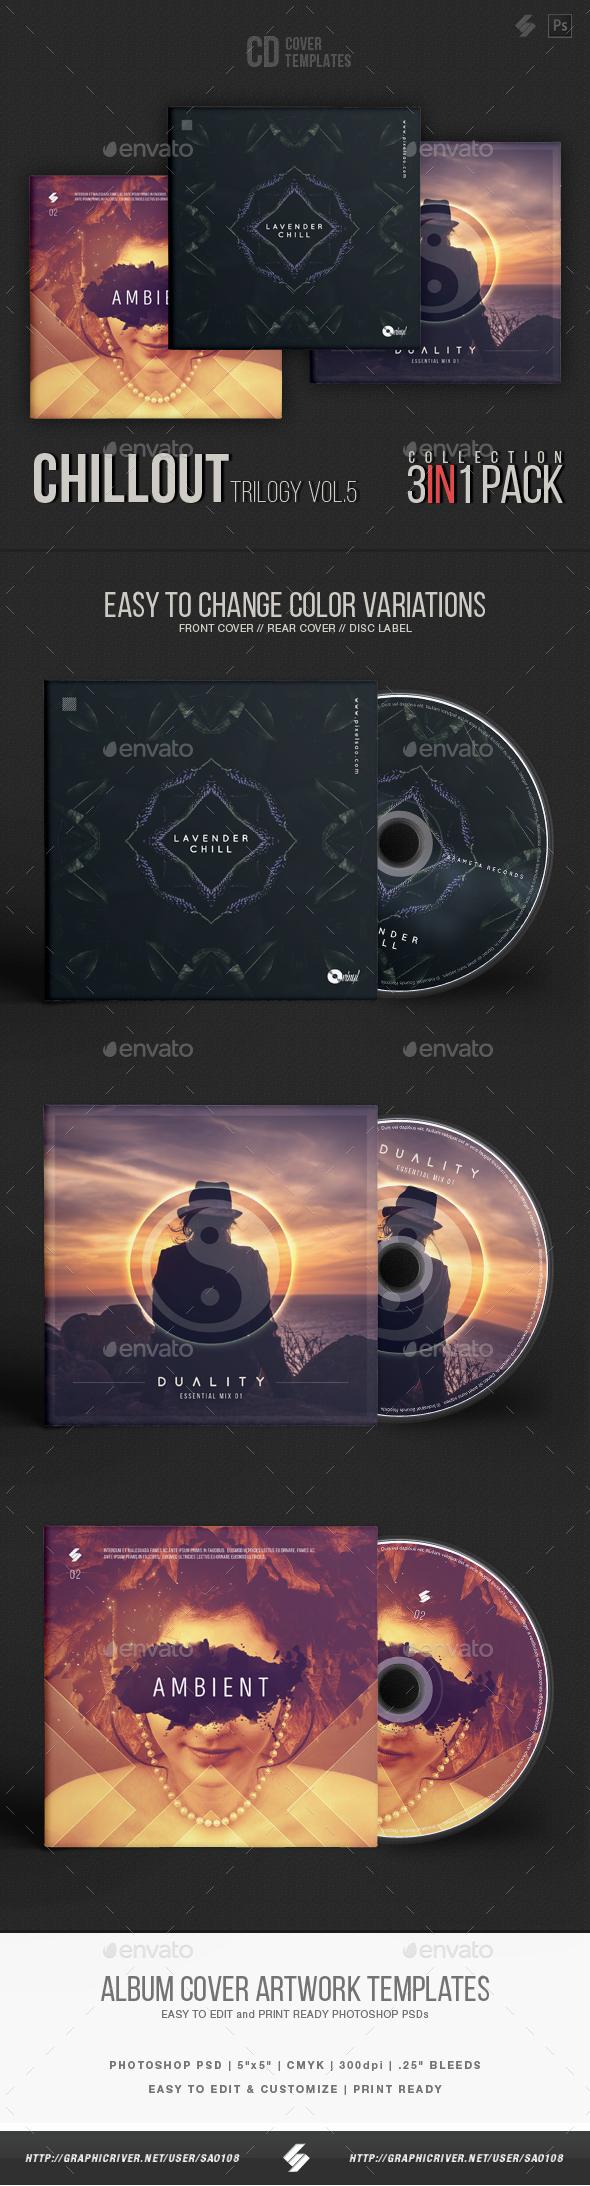 GraphicRiver Chillout Trilogy vol.5 CD Cover Templates Bundle 20898292